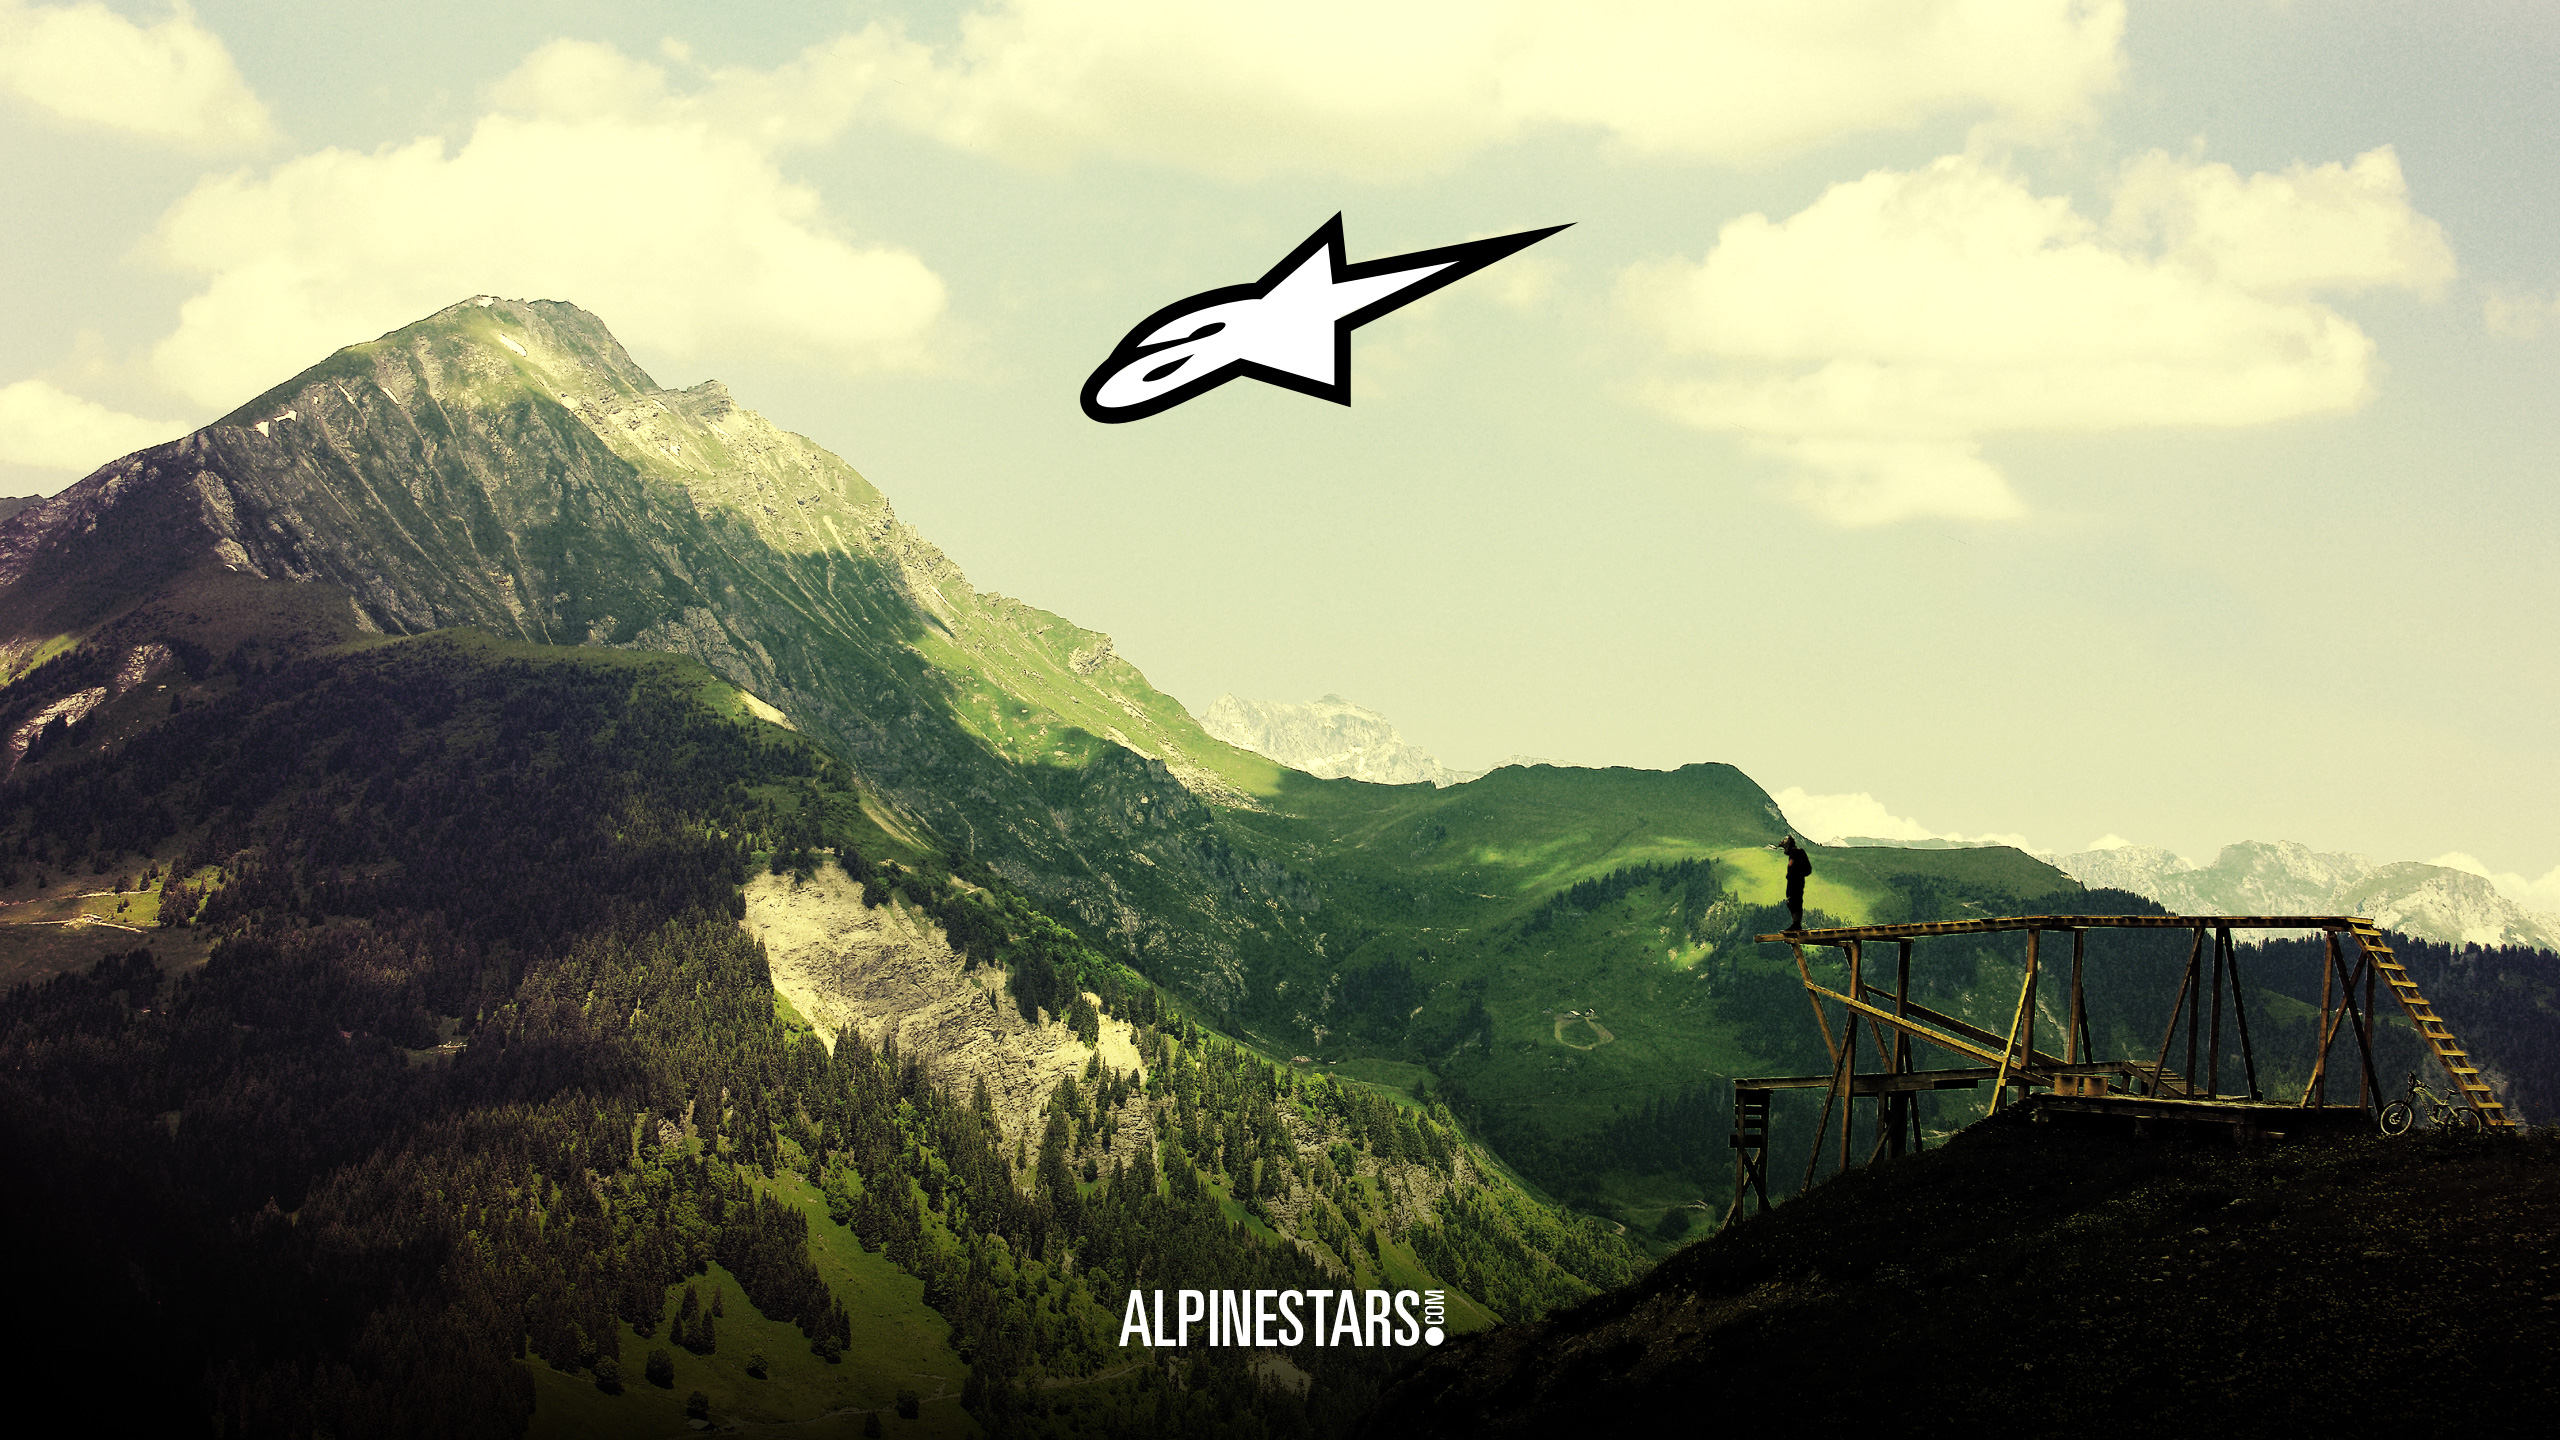 Downloads Alpinestars 2560x1440